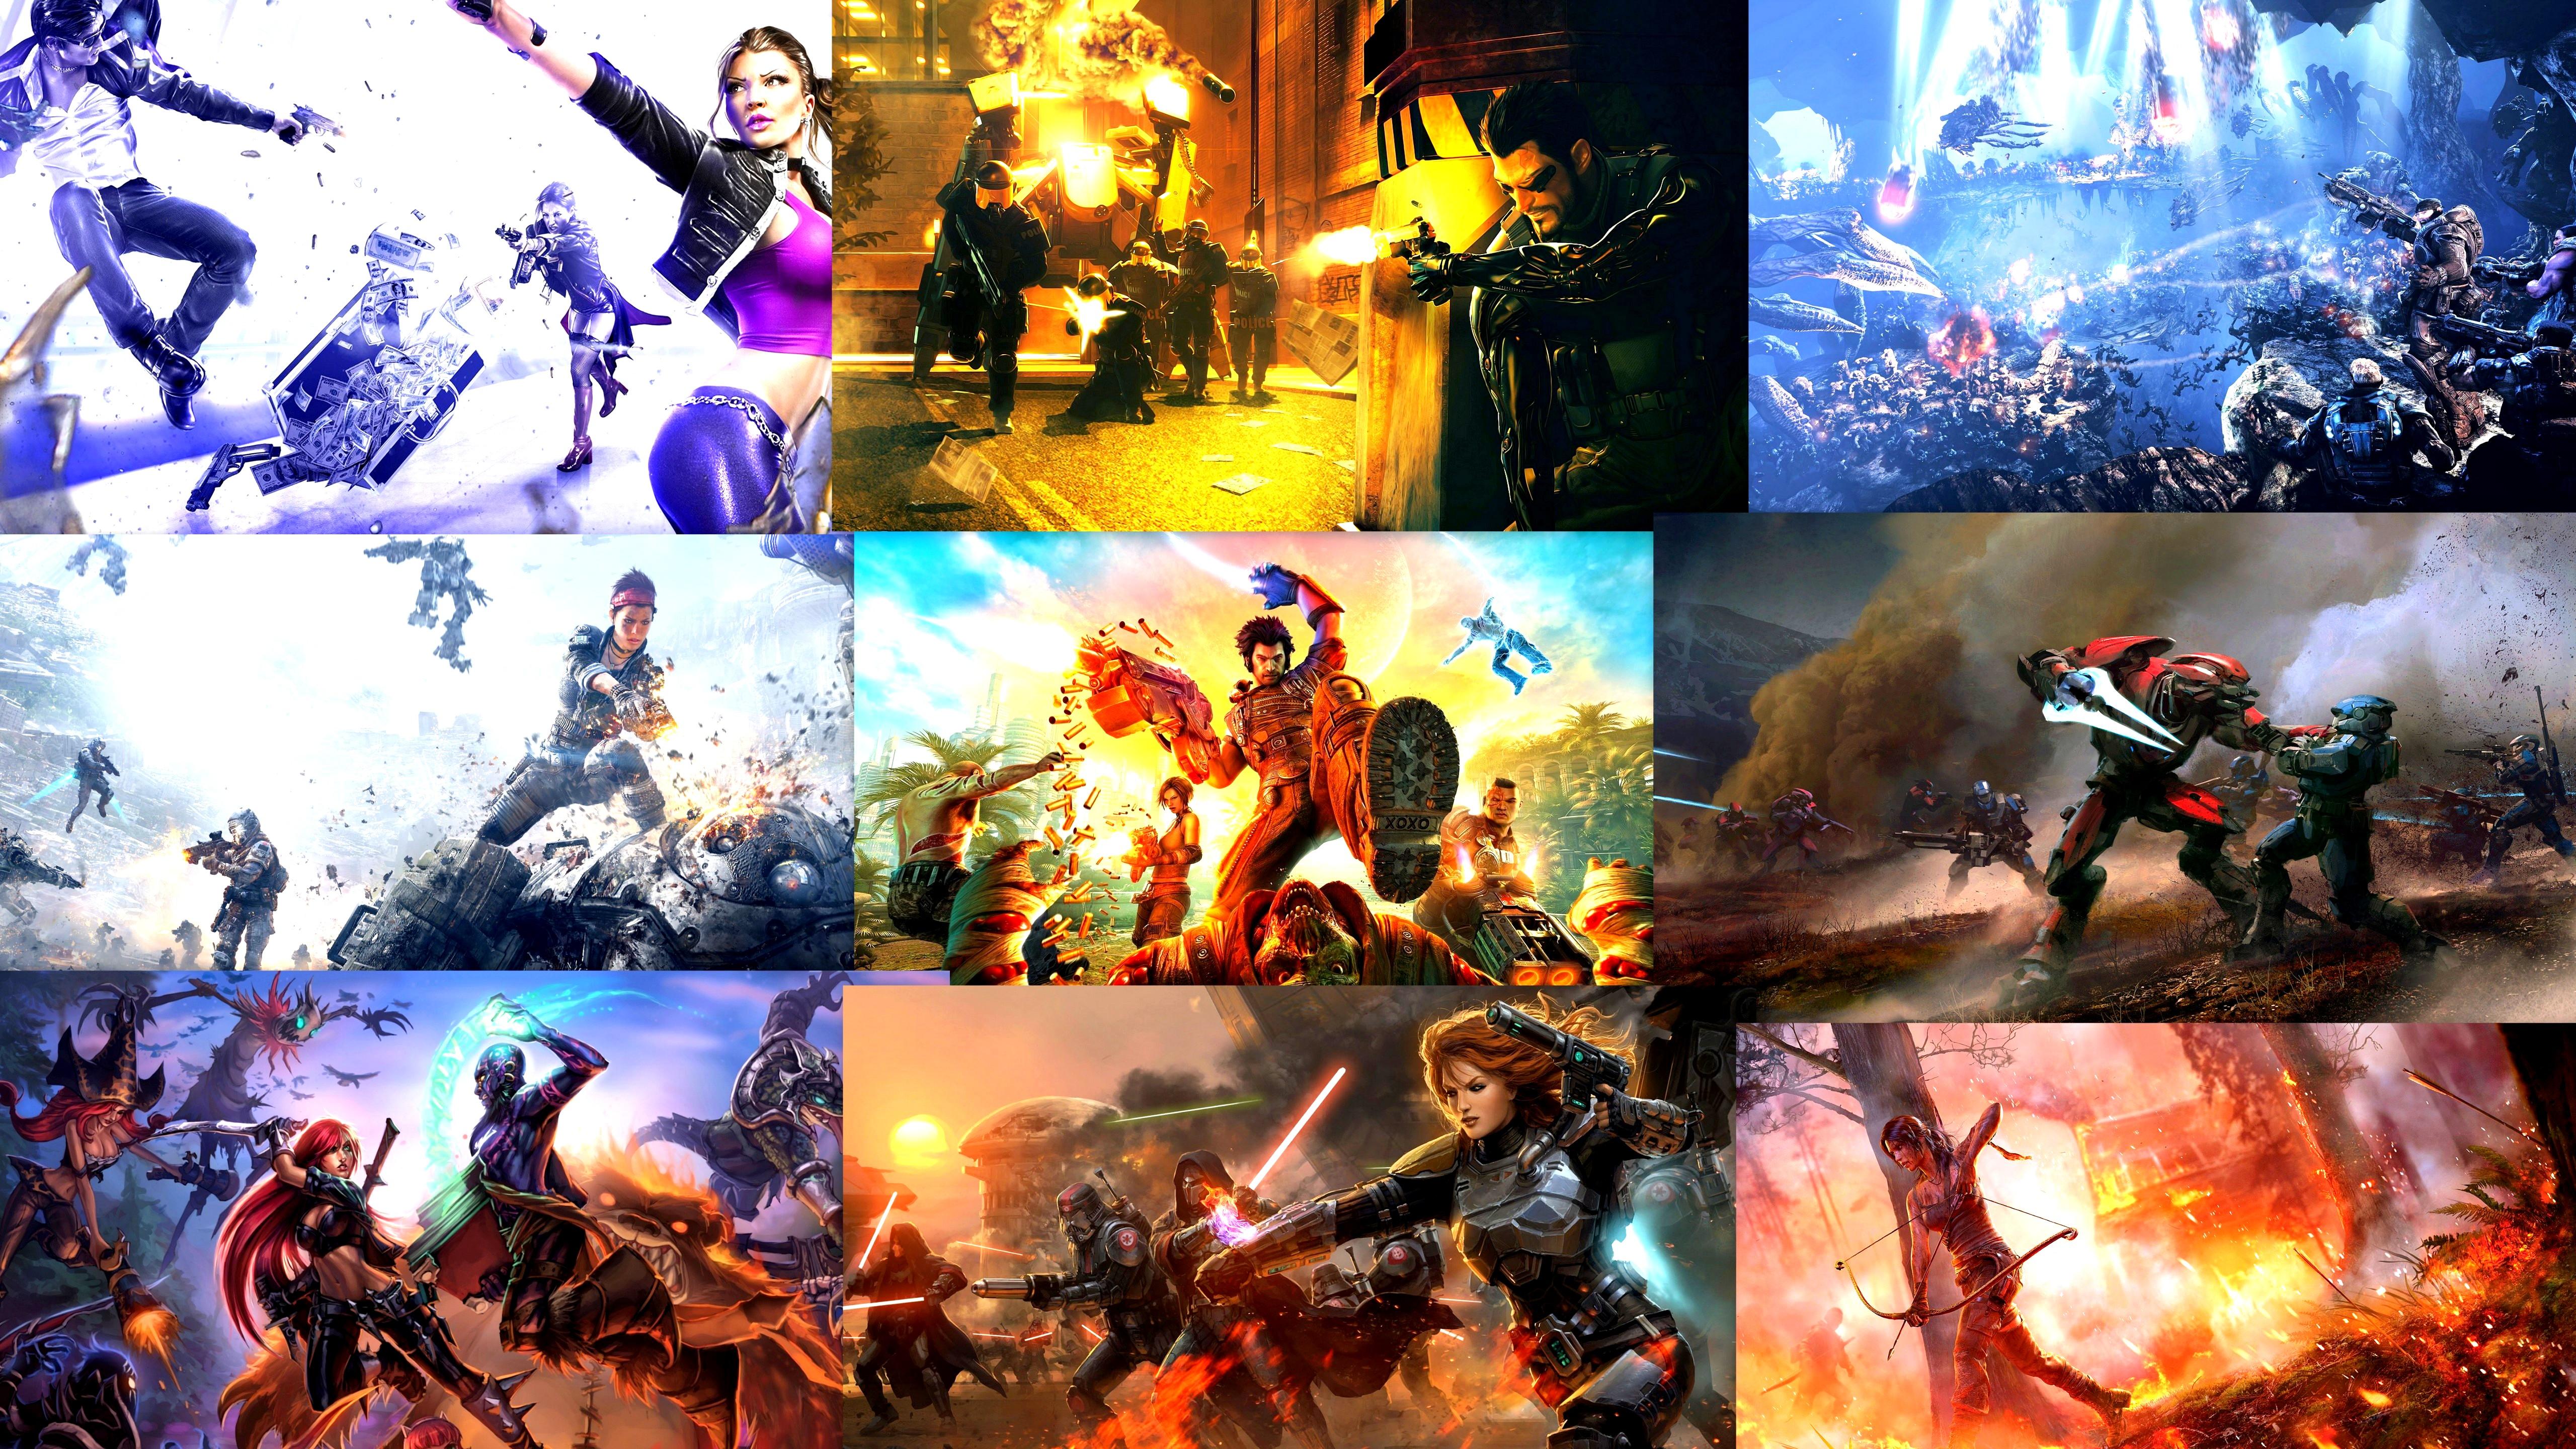 Gaming Large Battles 5k Retina Ultra HD Wallpaper And Background